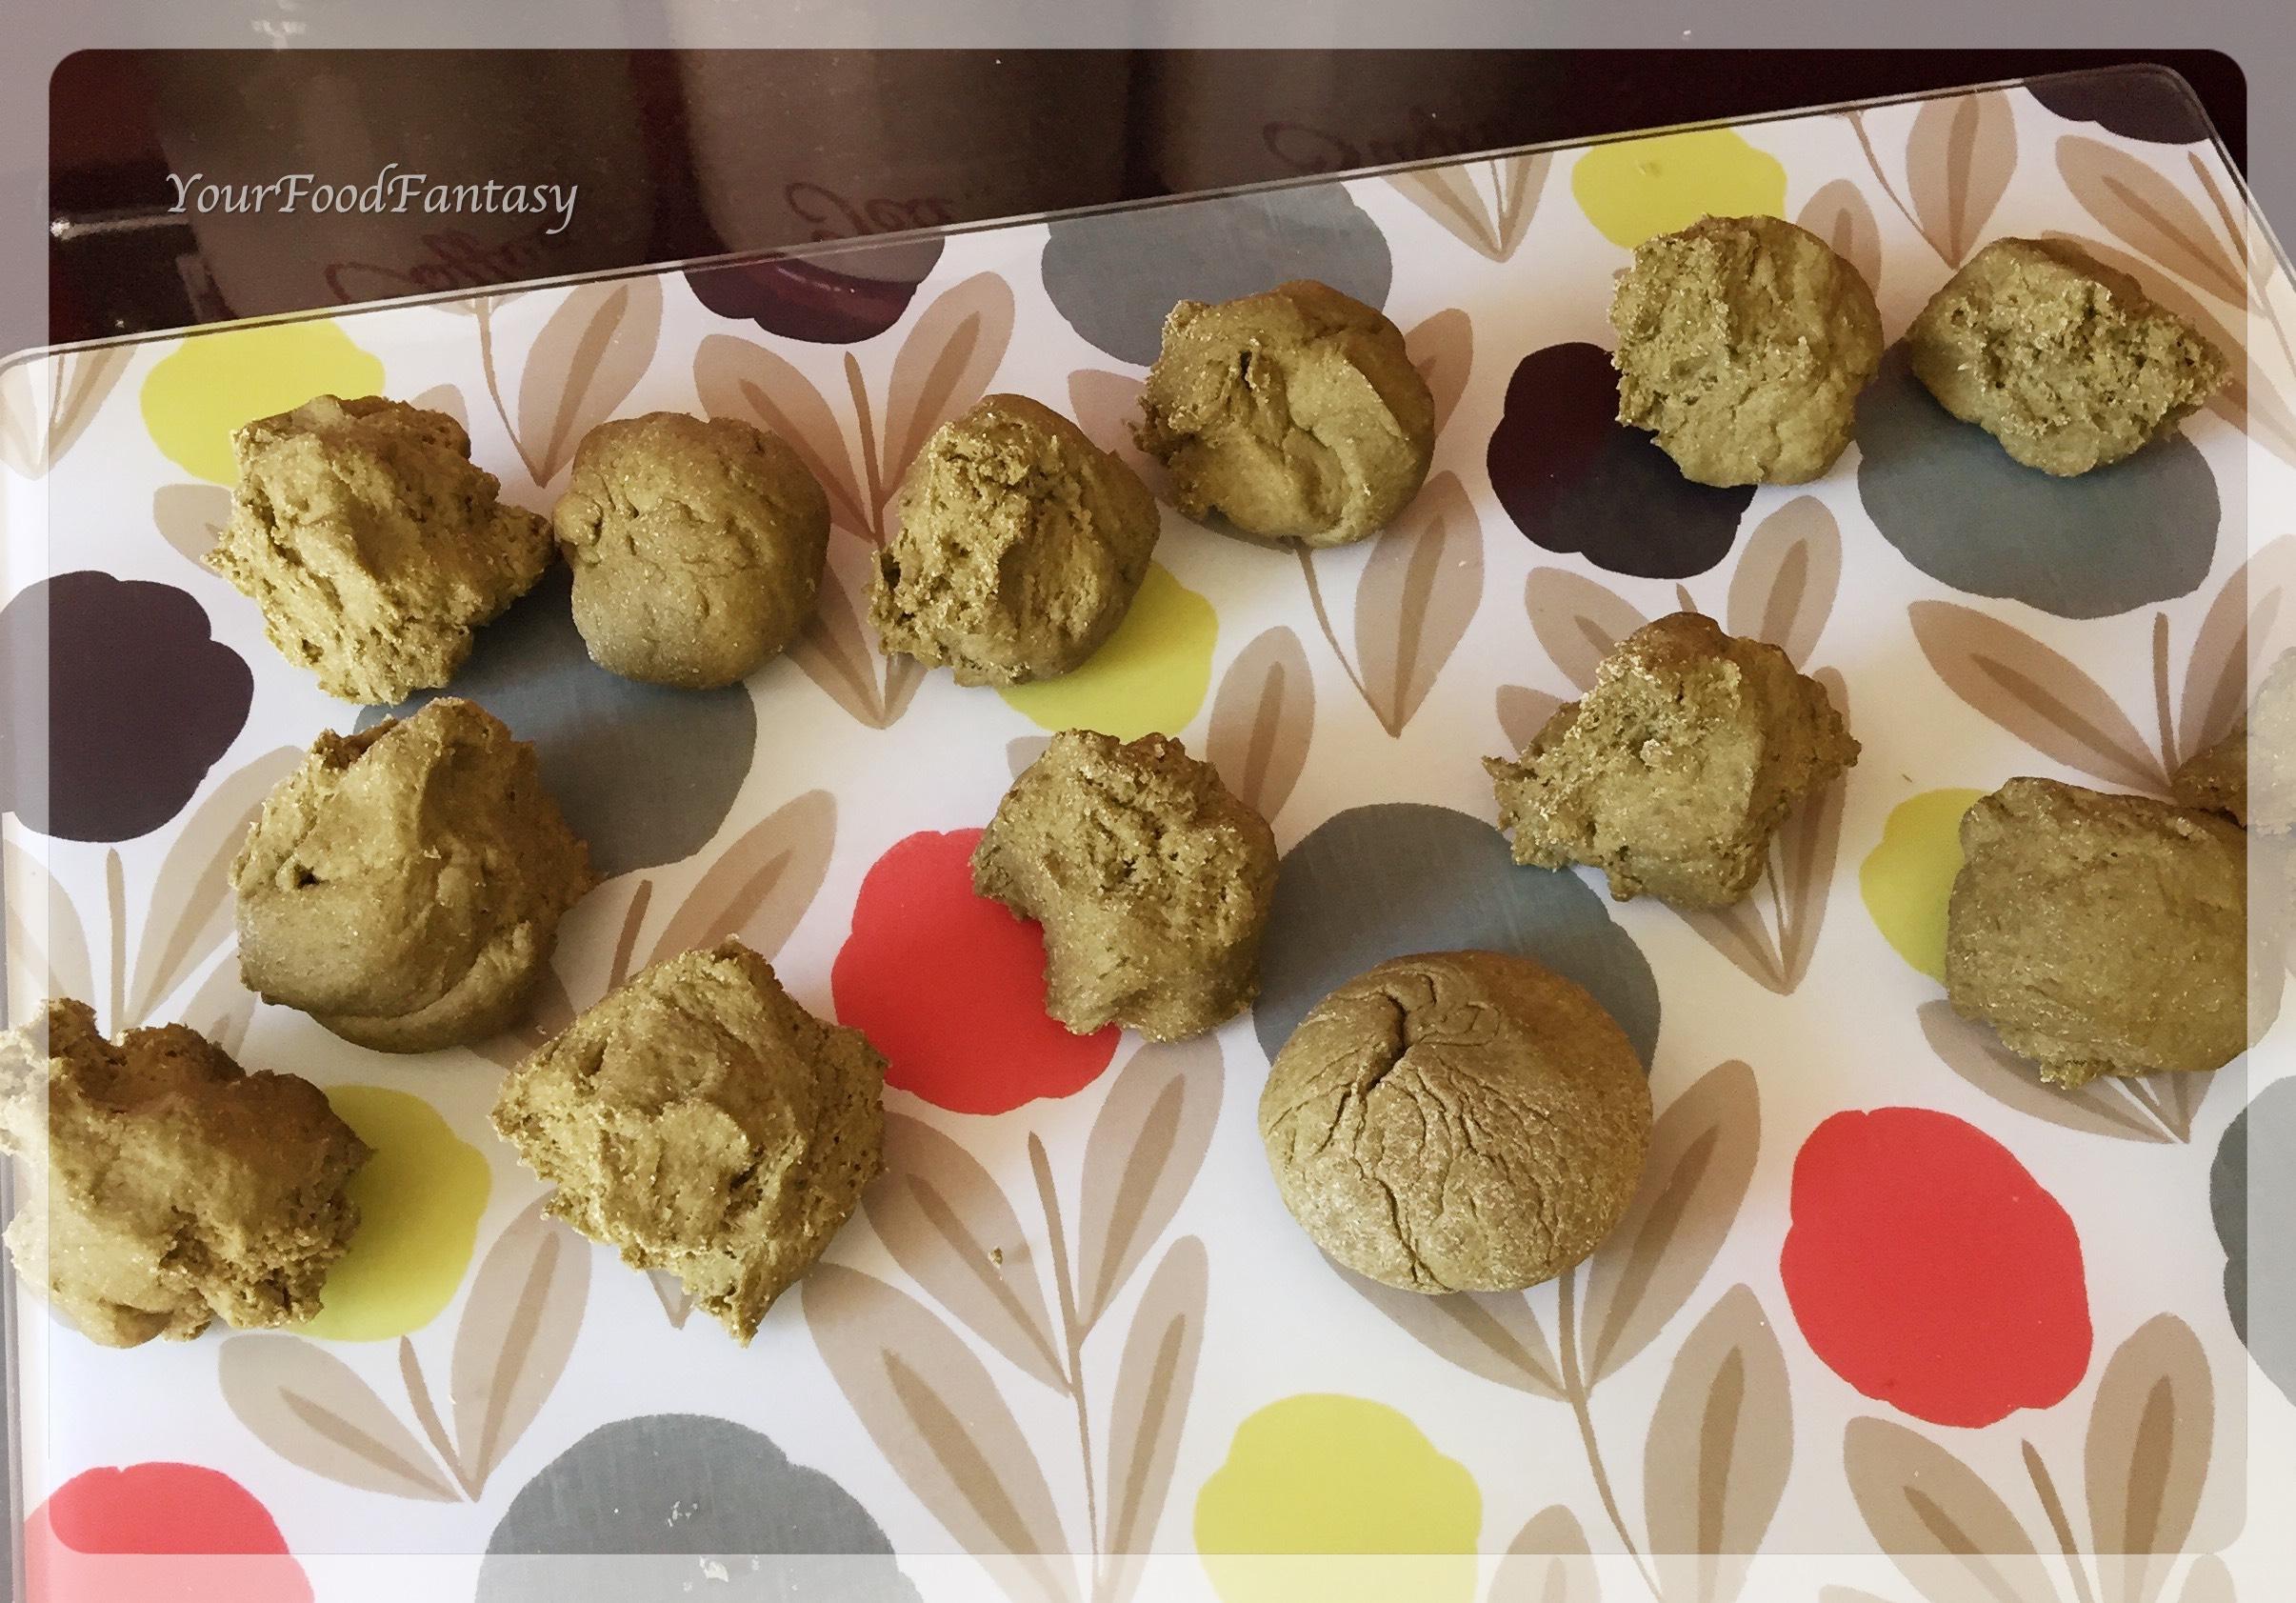 dough balls for palak poori | yourfoodfantasy.com by meenu gupta